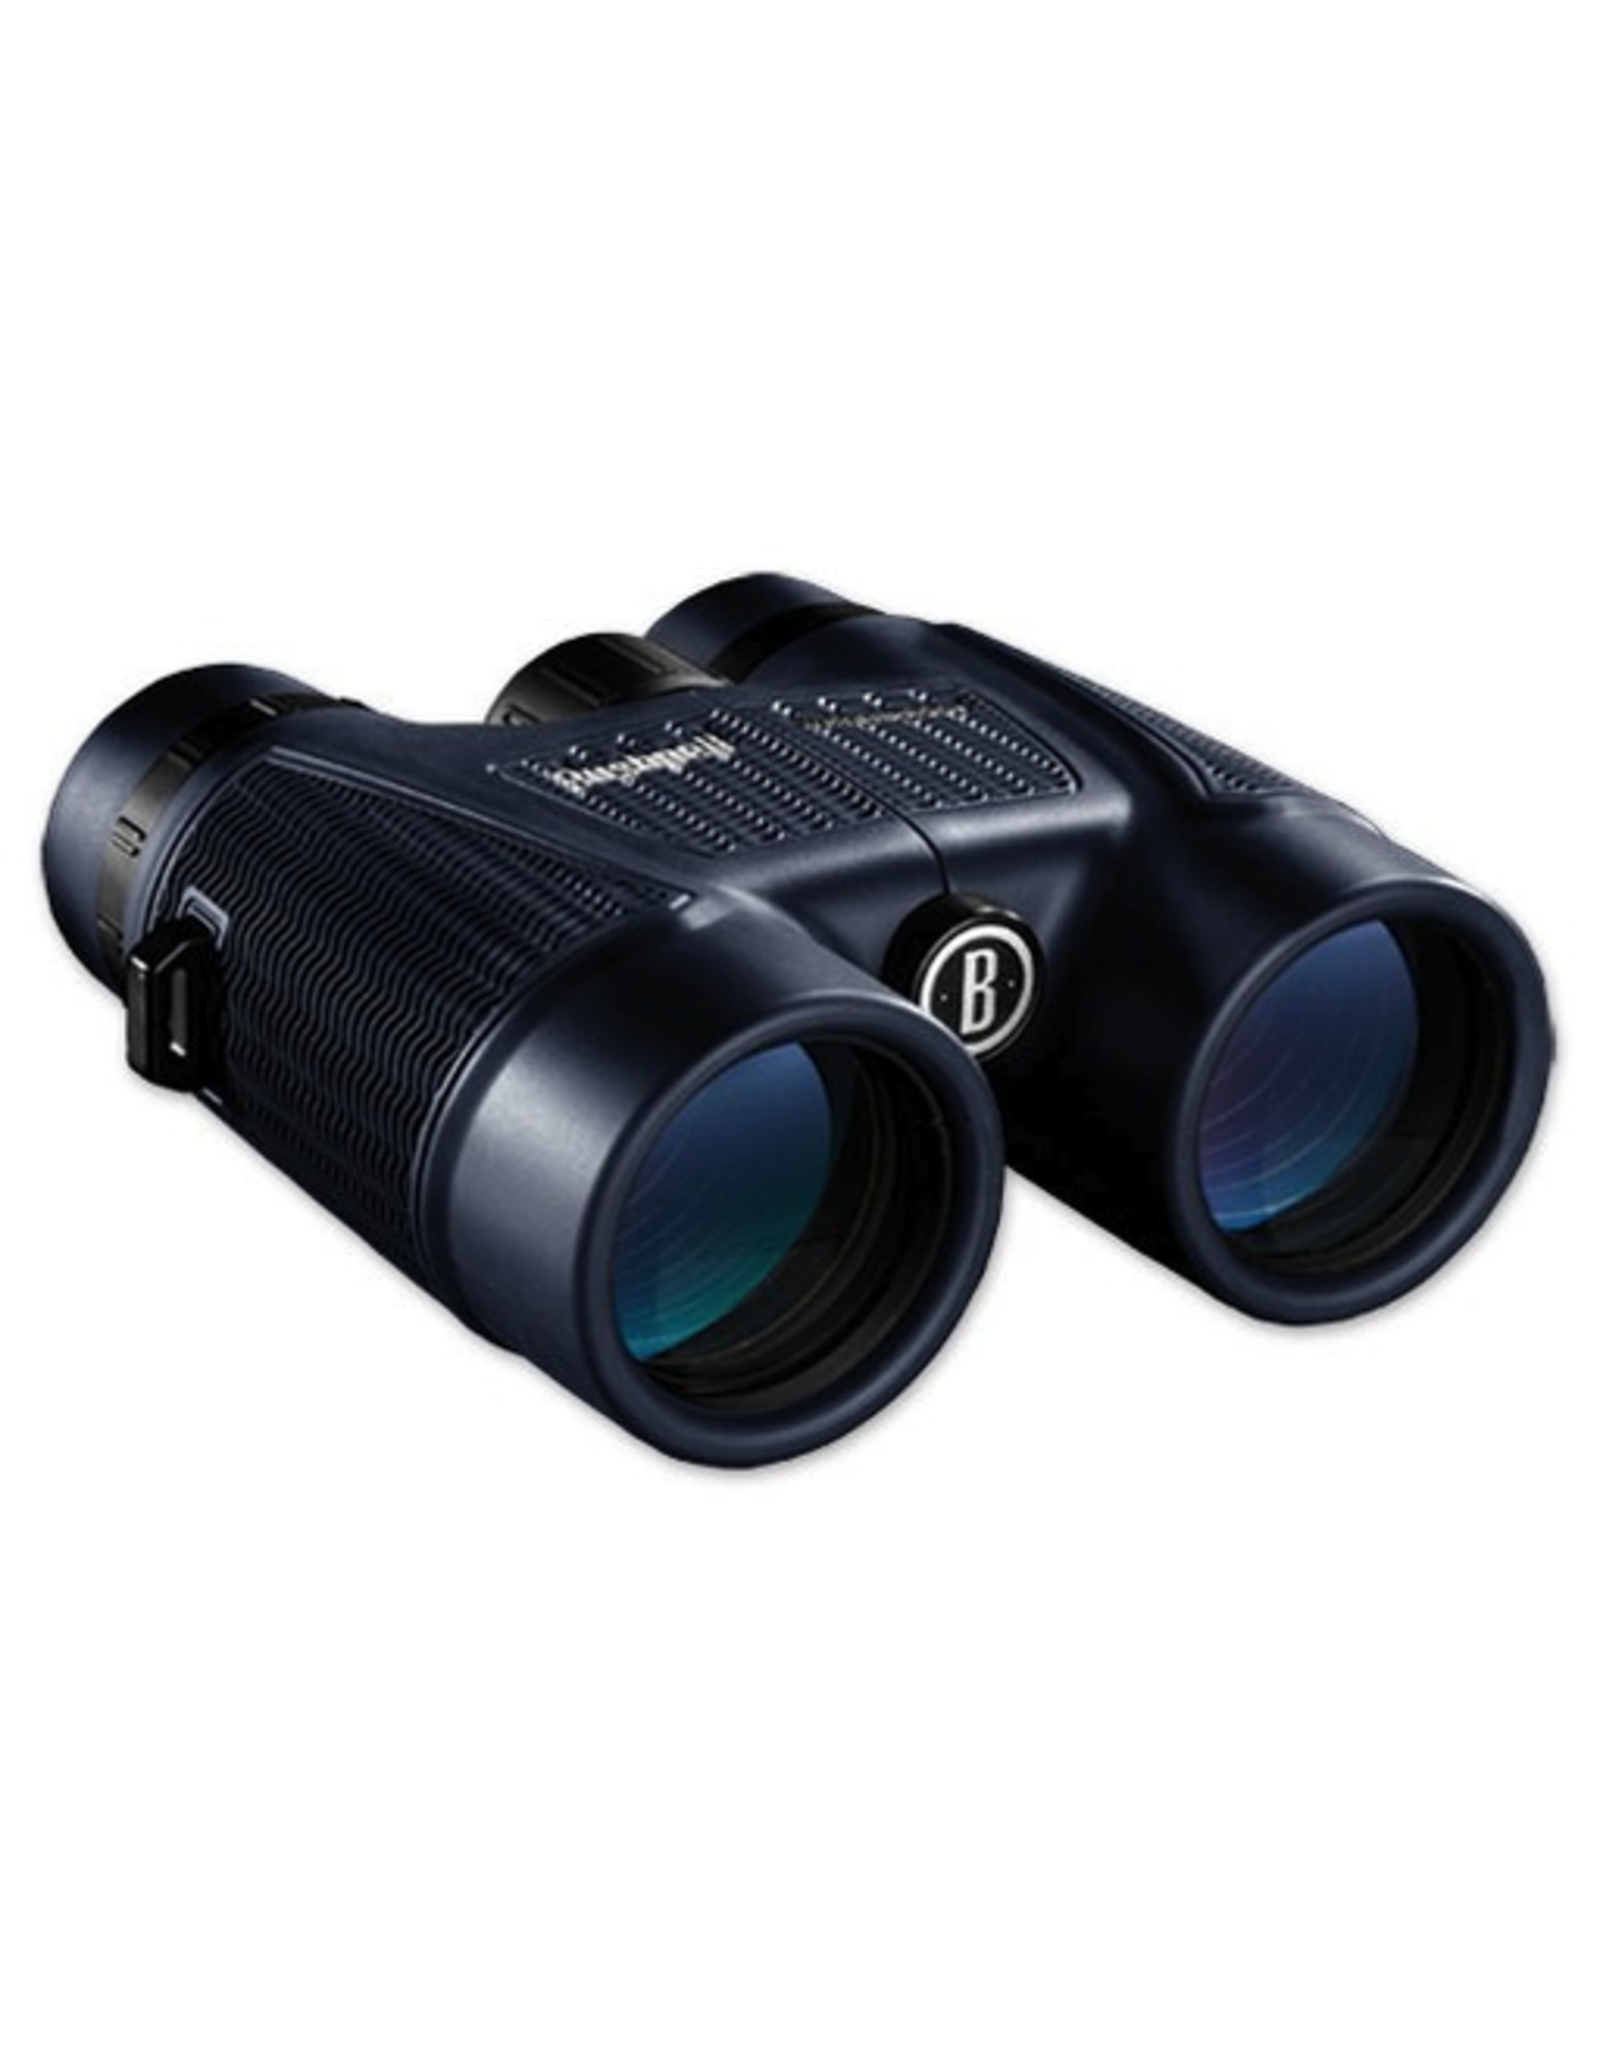 Bushnell Bushnell H2O Waterproof Binoculars, 10 x 42 mm